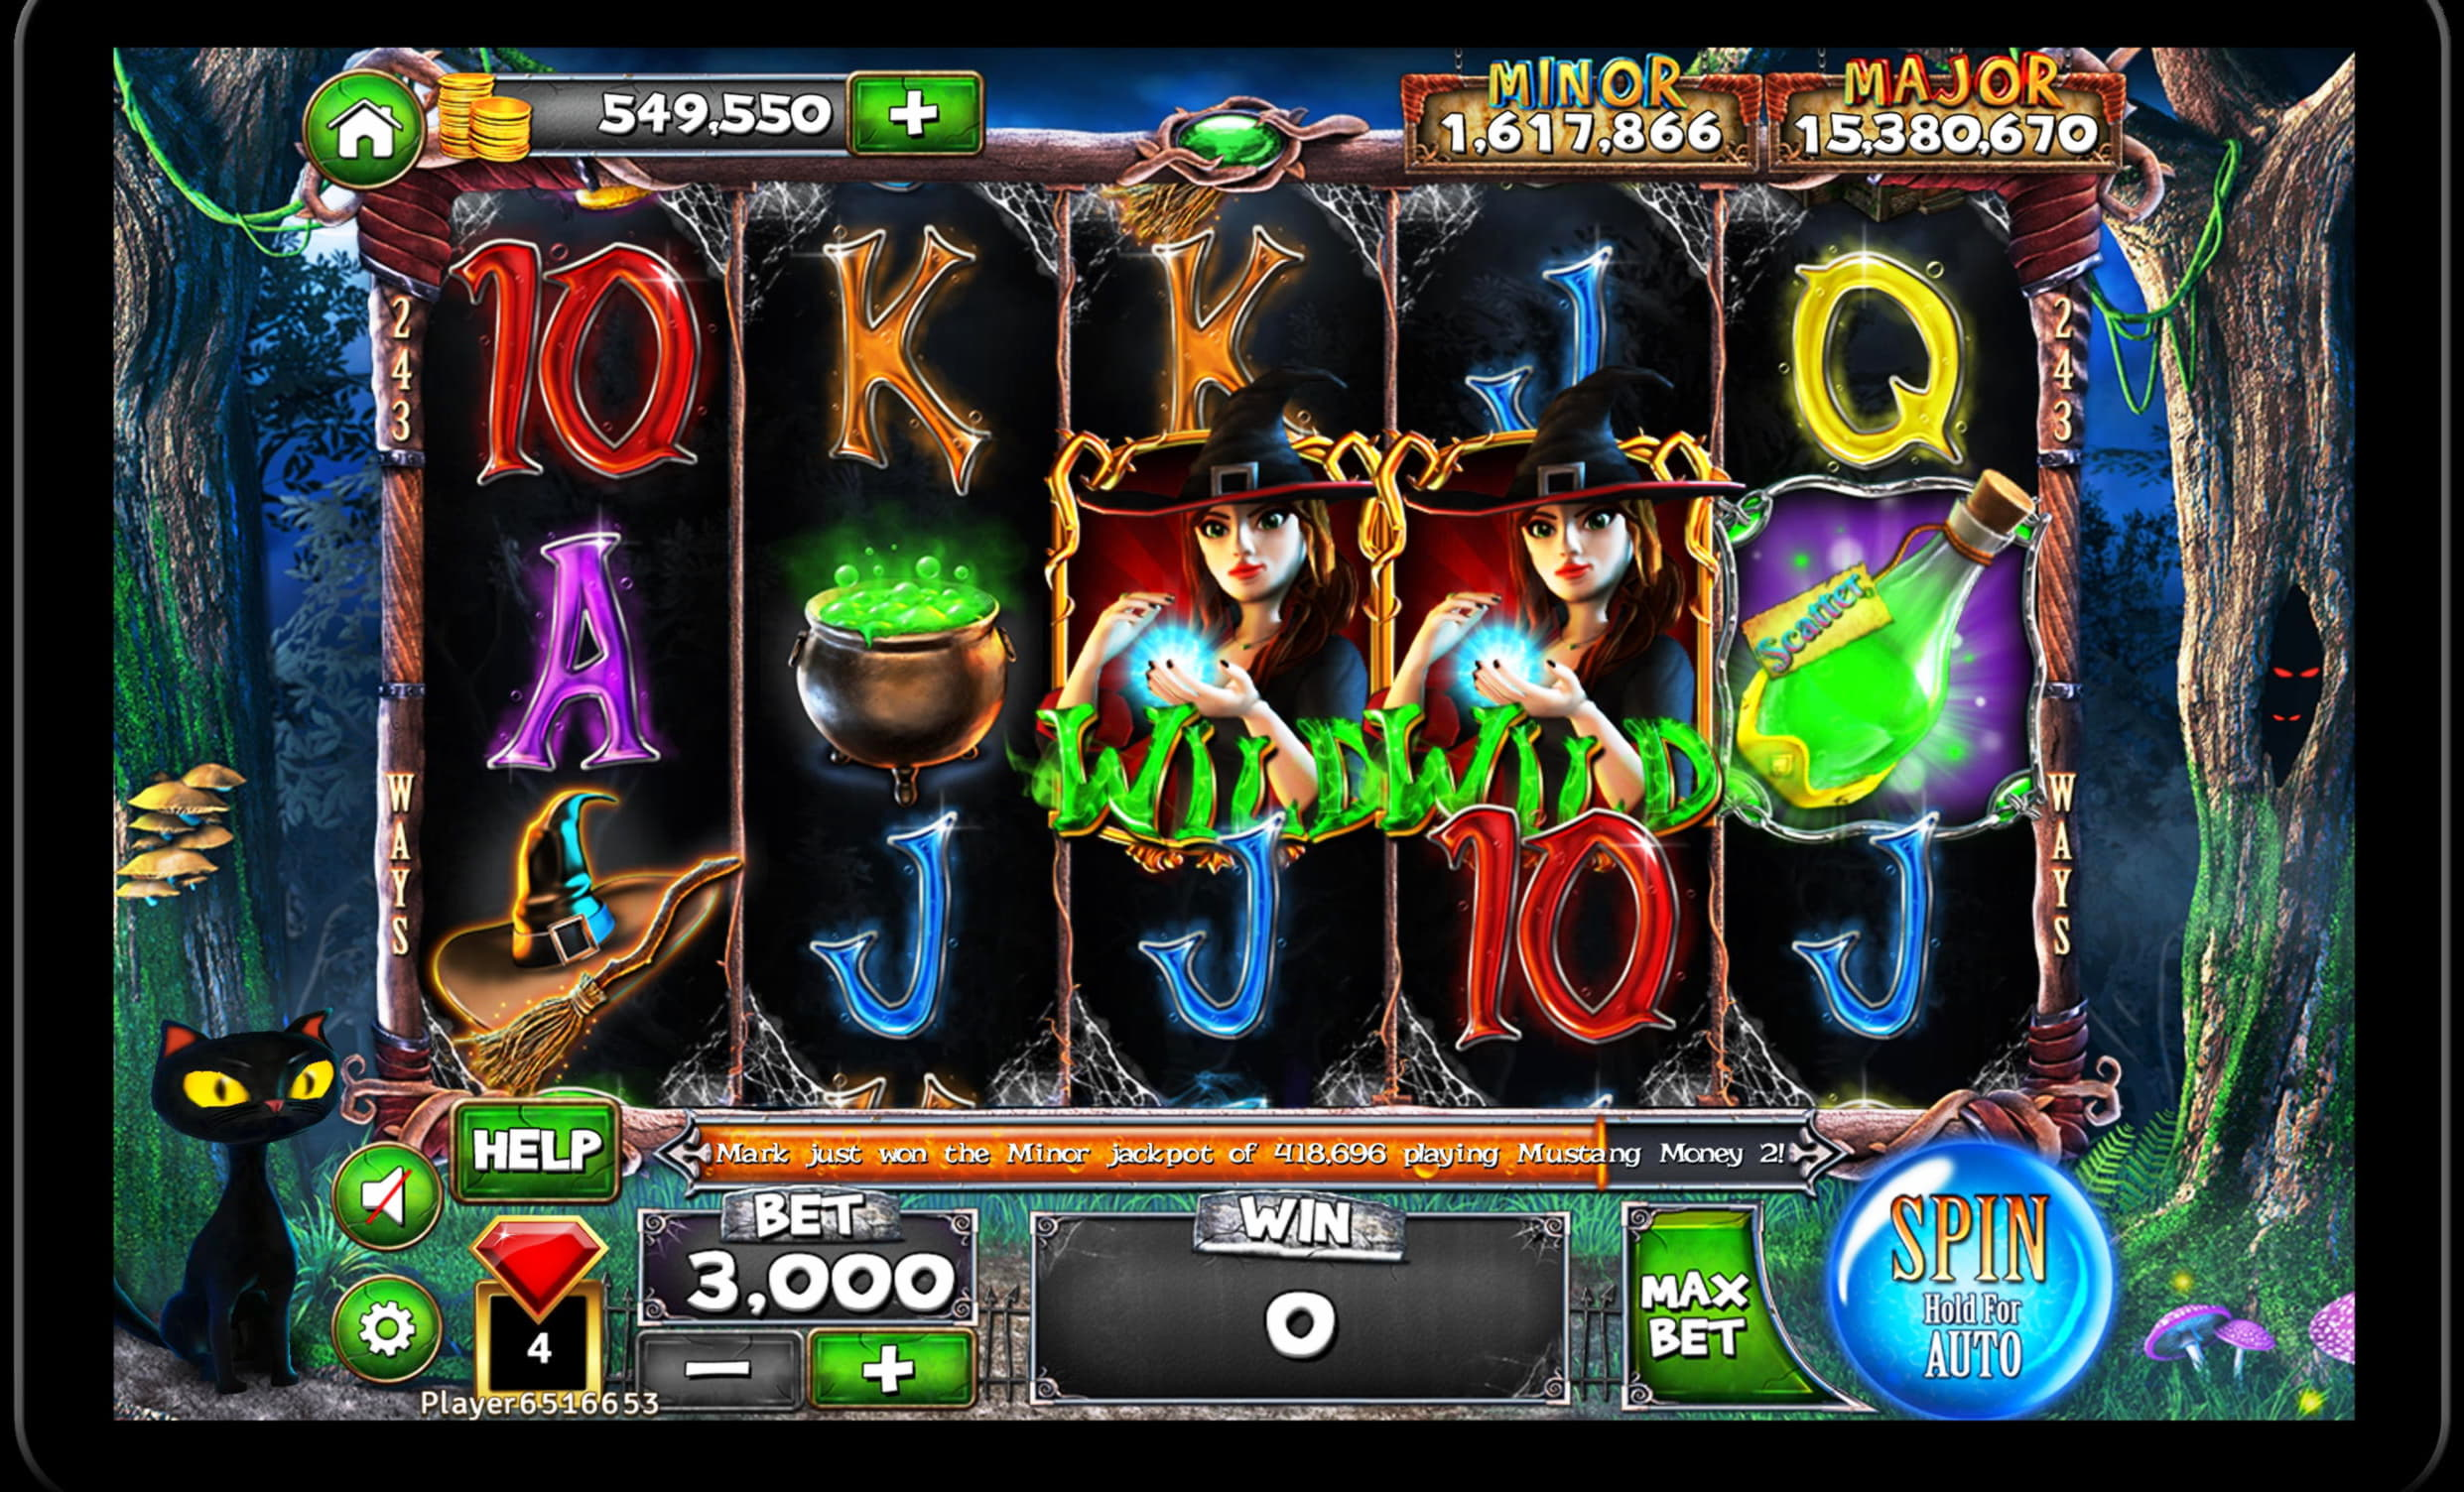 EUR 385 Daily freeroll slot tournament at Gaming Club Casino